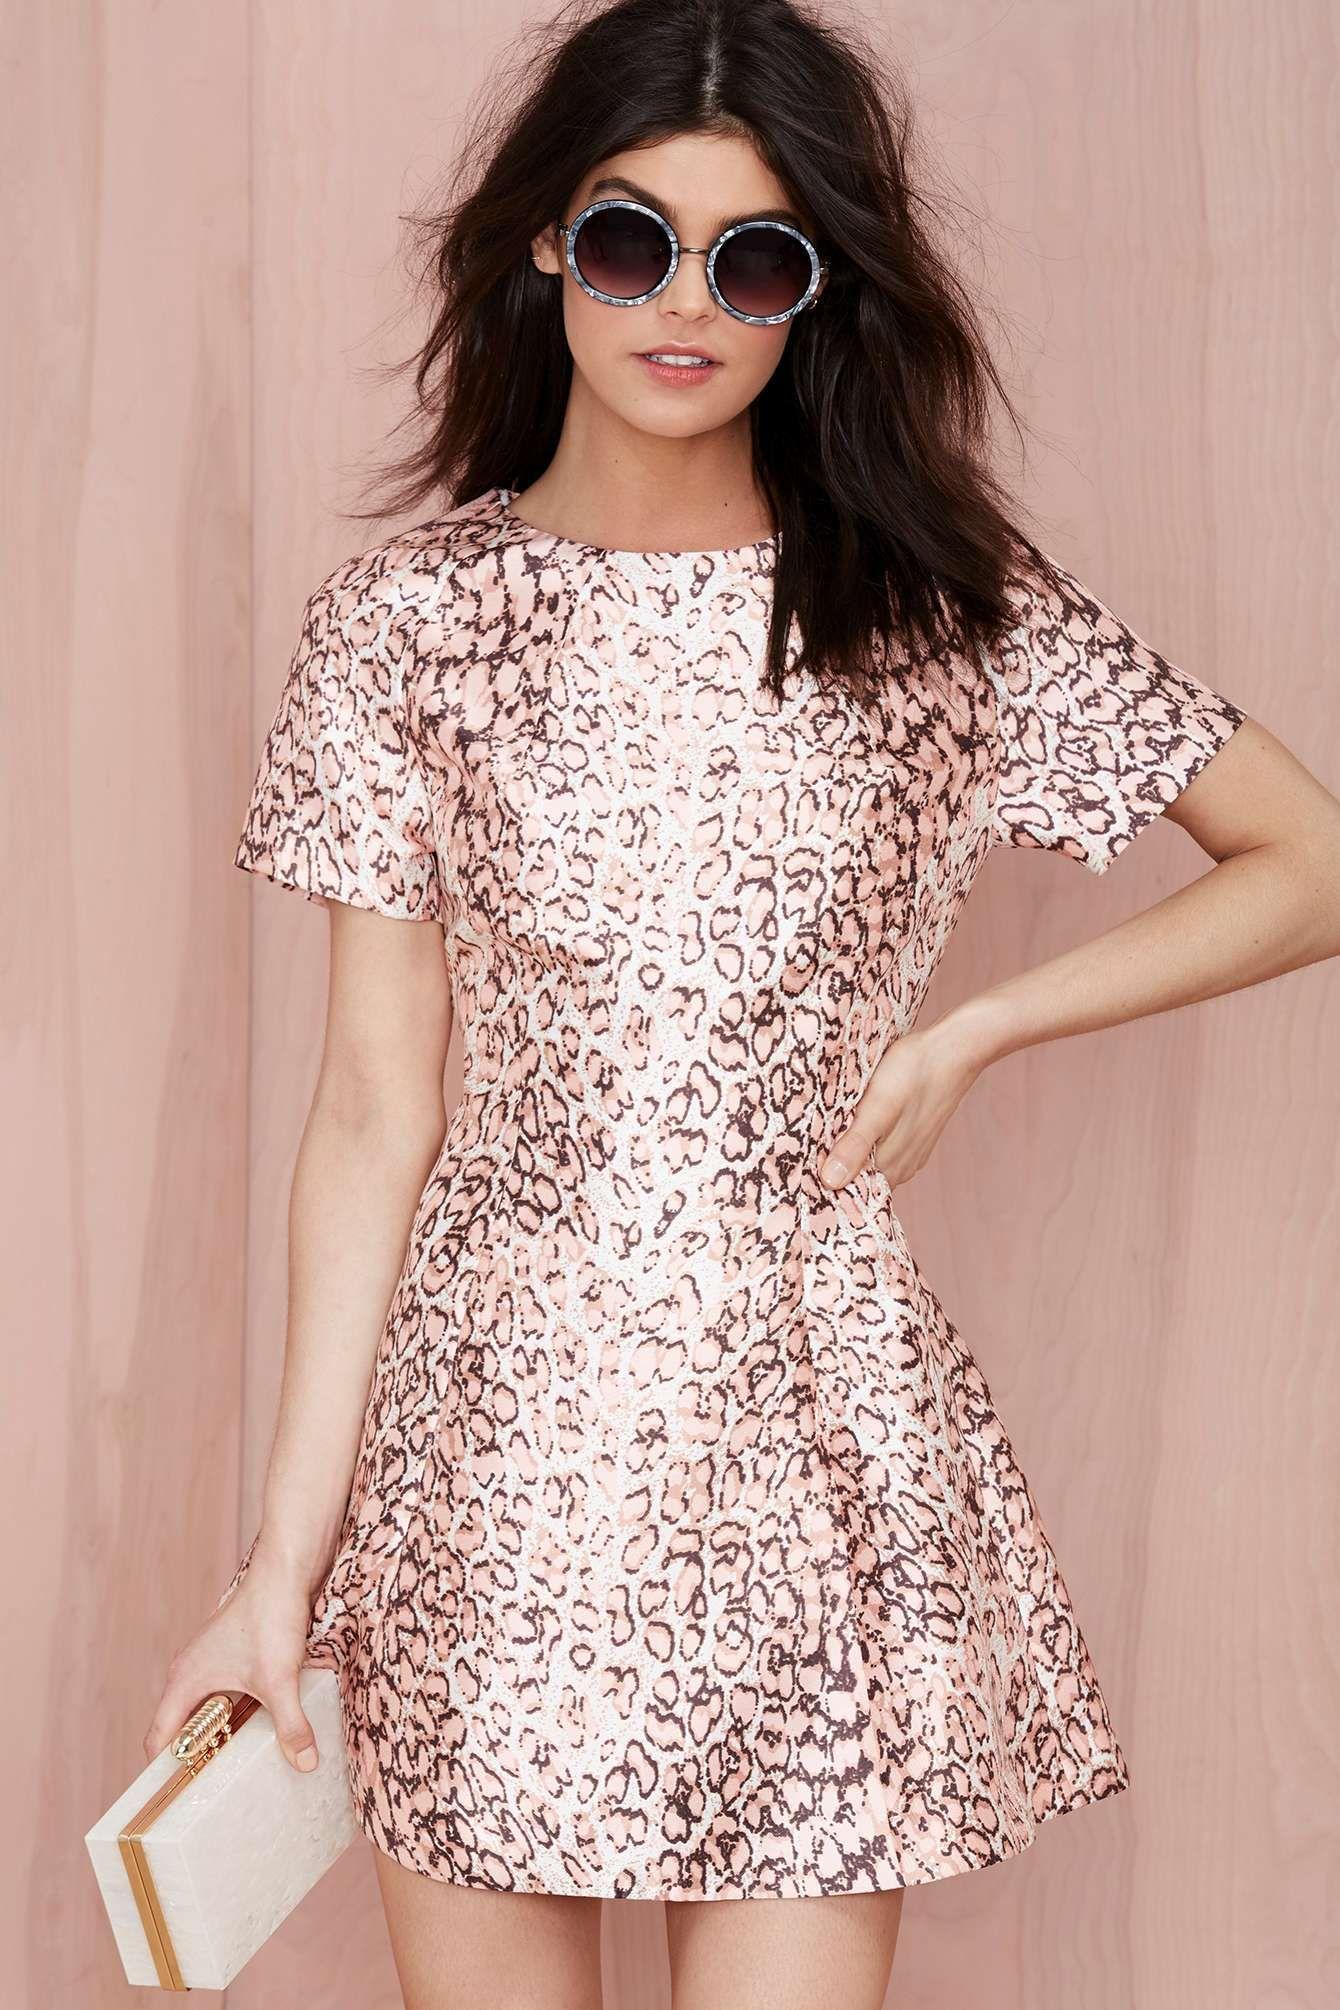 super pretty dress!!!